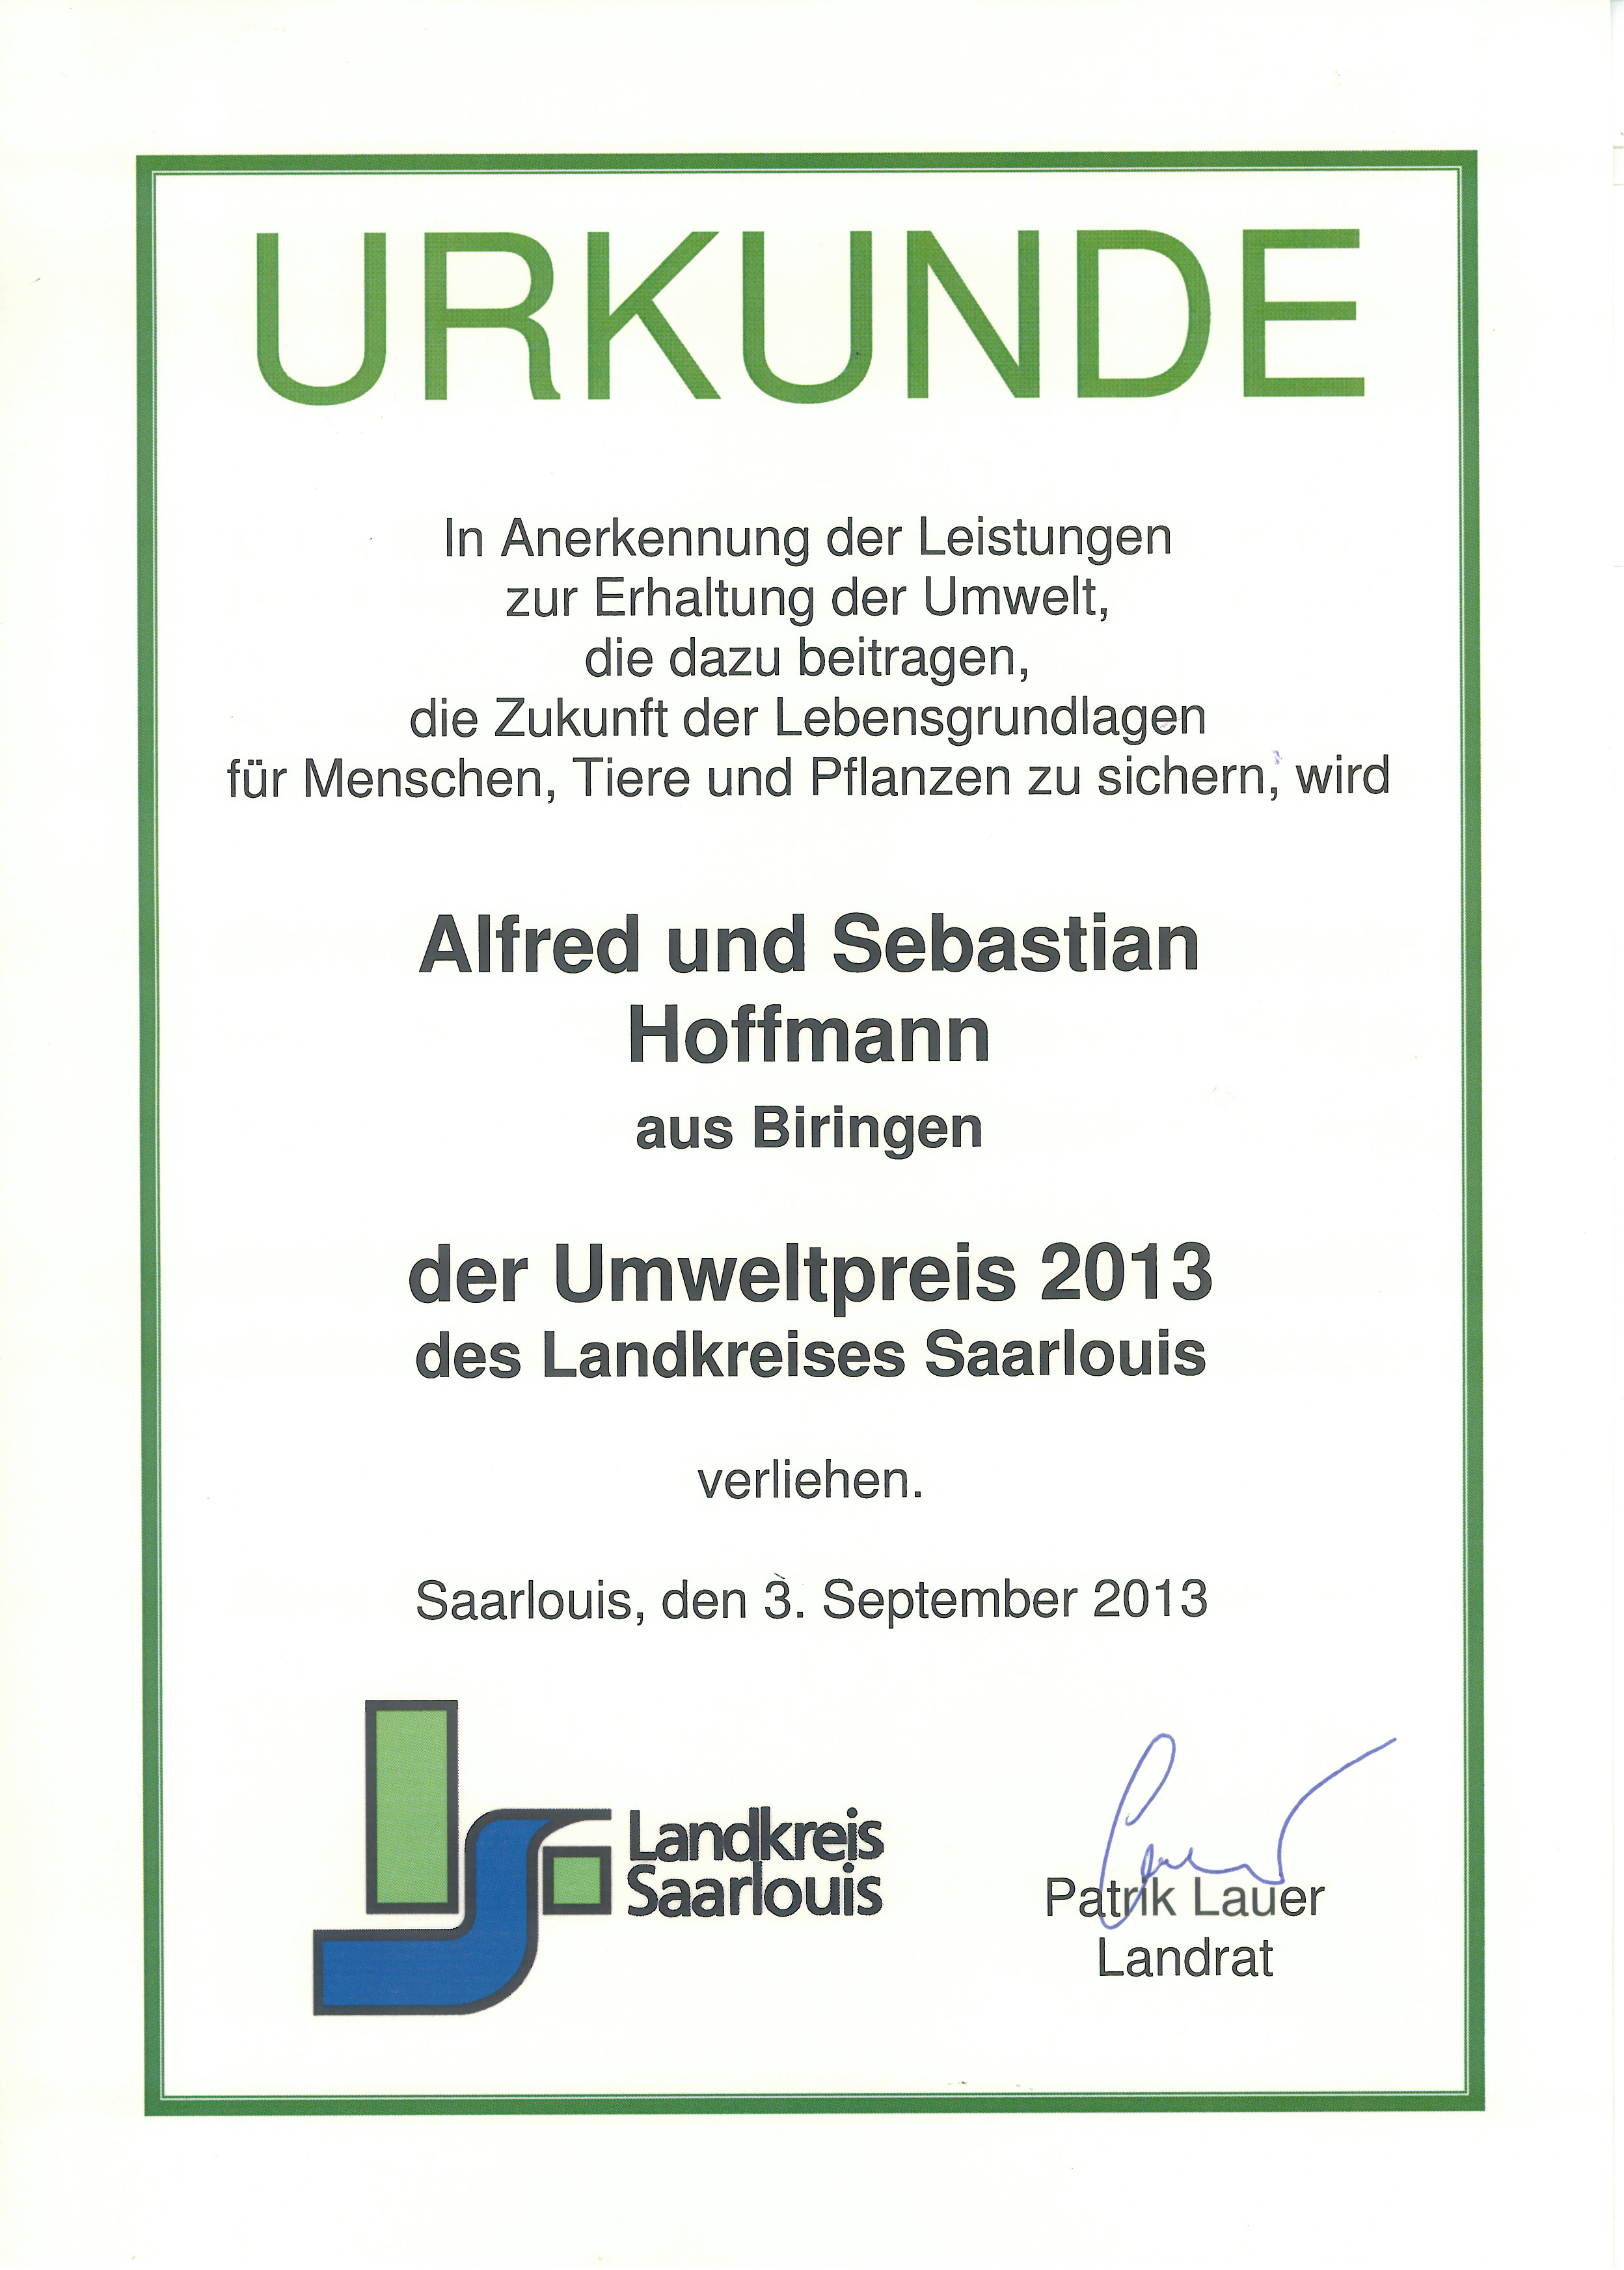 2013 09 03 Kreisumweltpreis